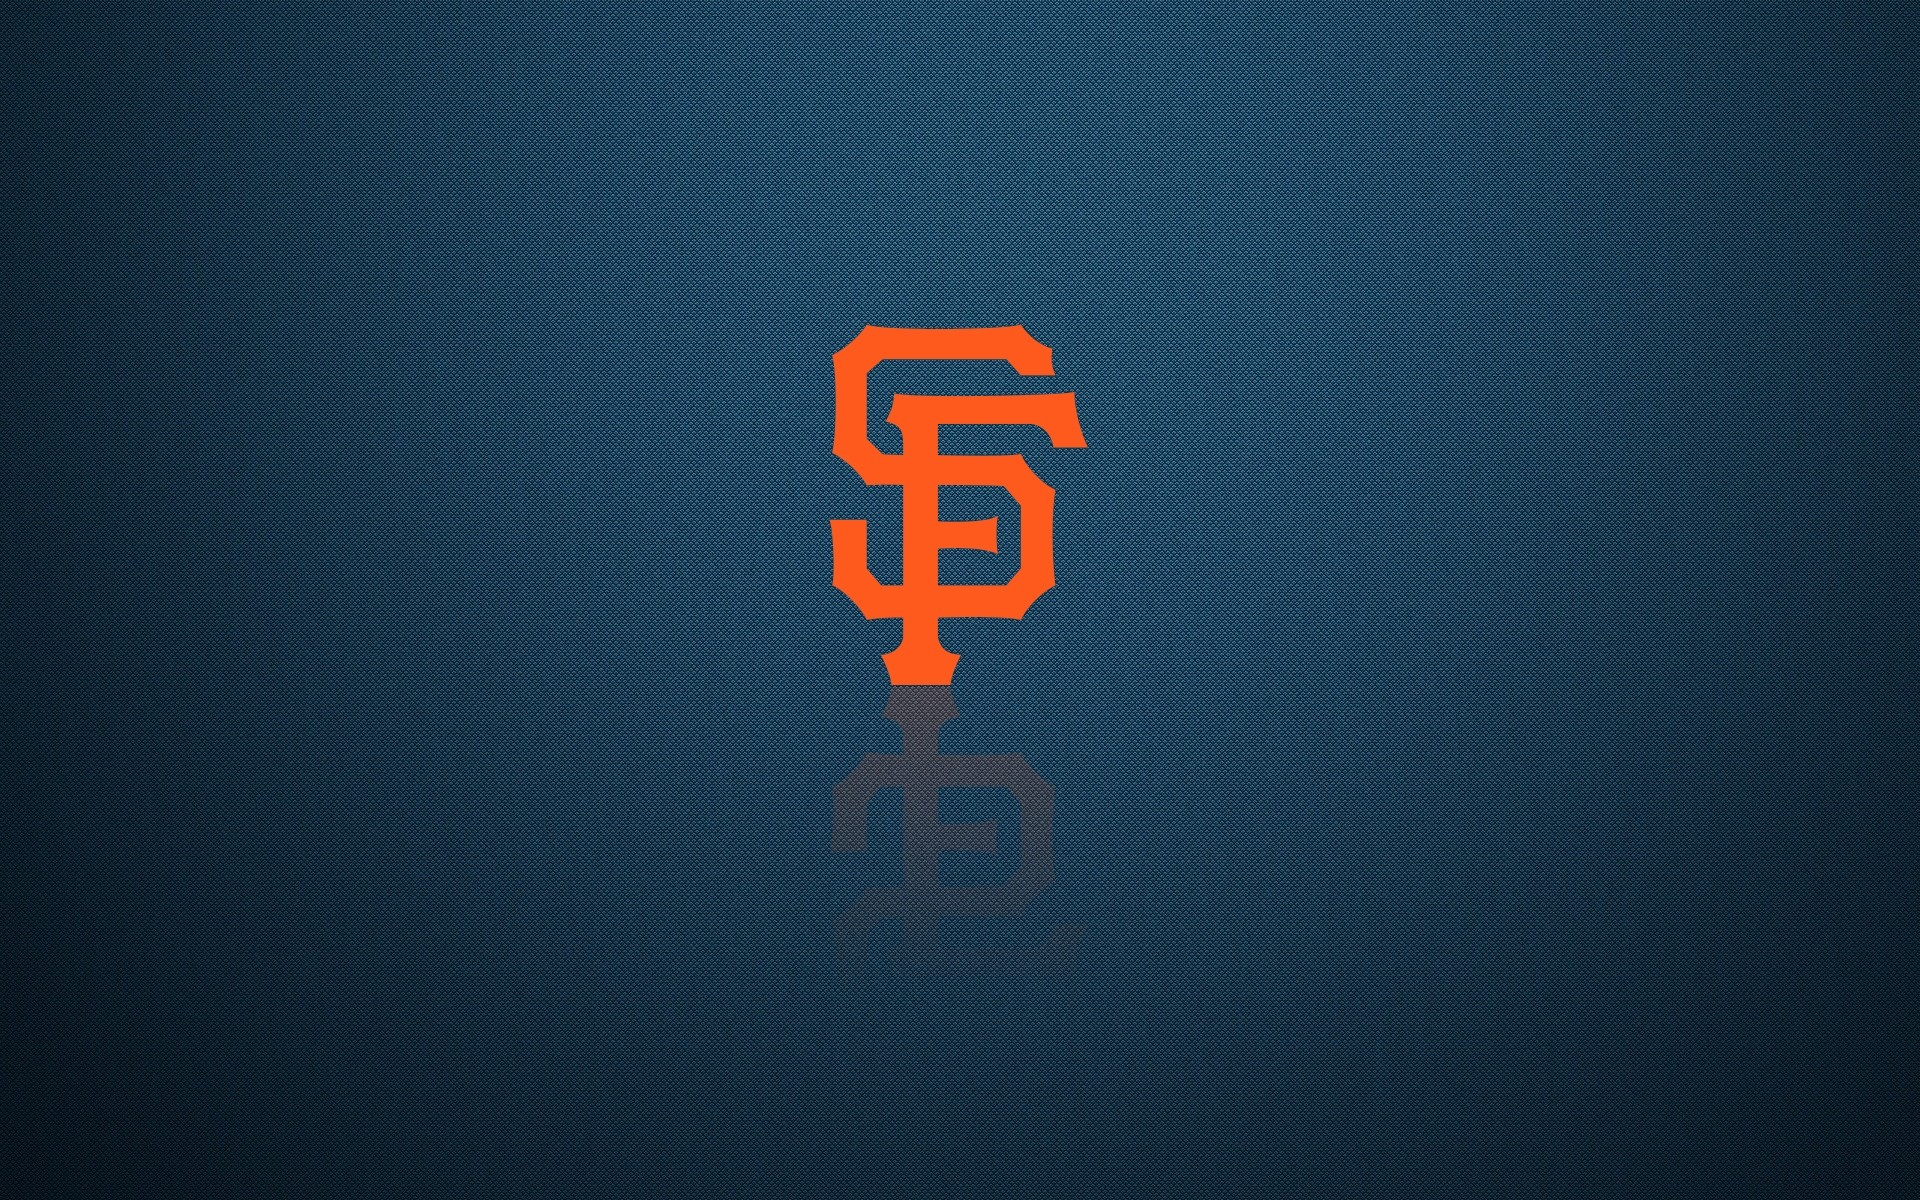 San Francisco Giants Logo Wallpapers Wallpapertag